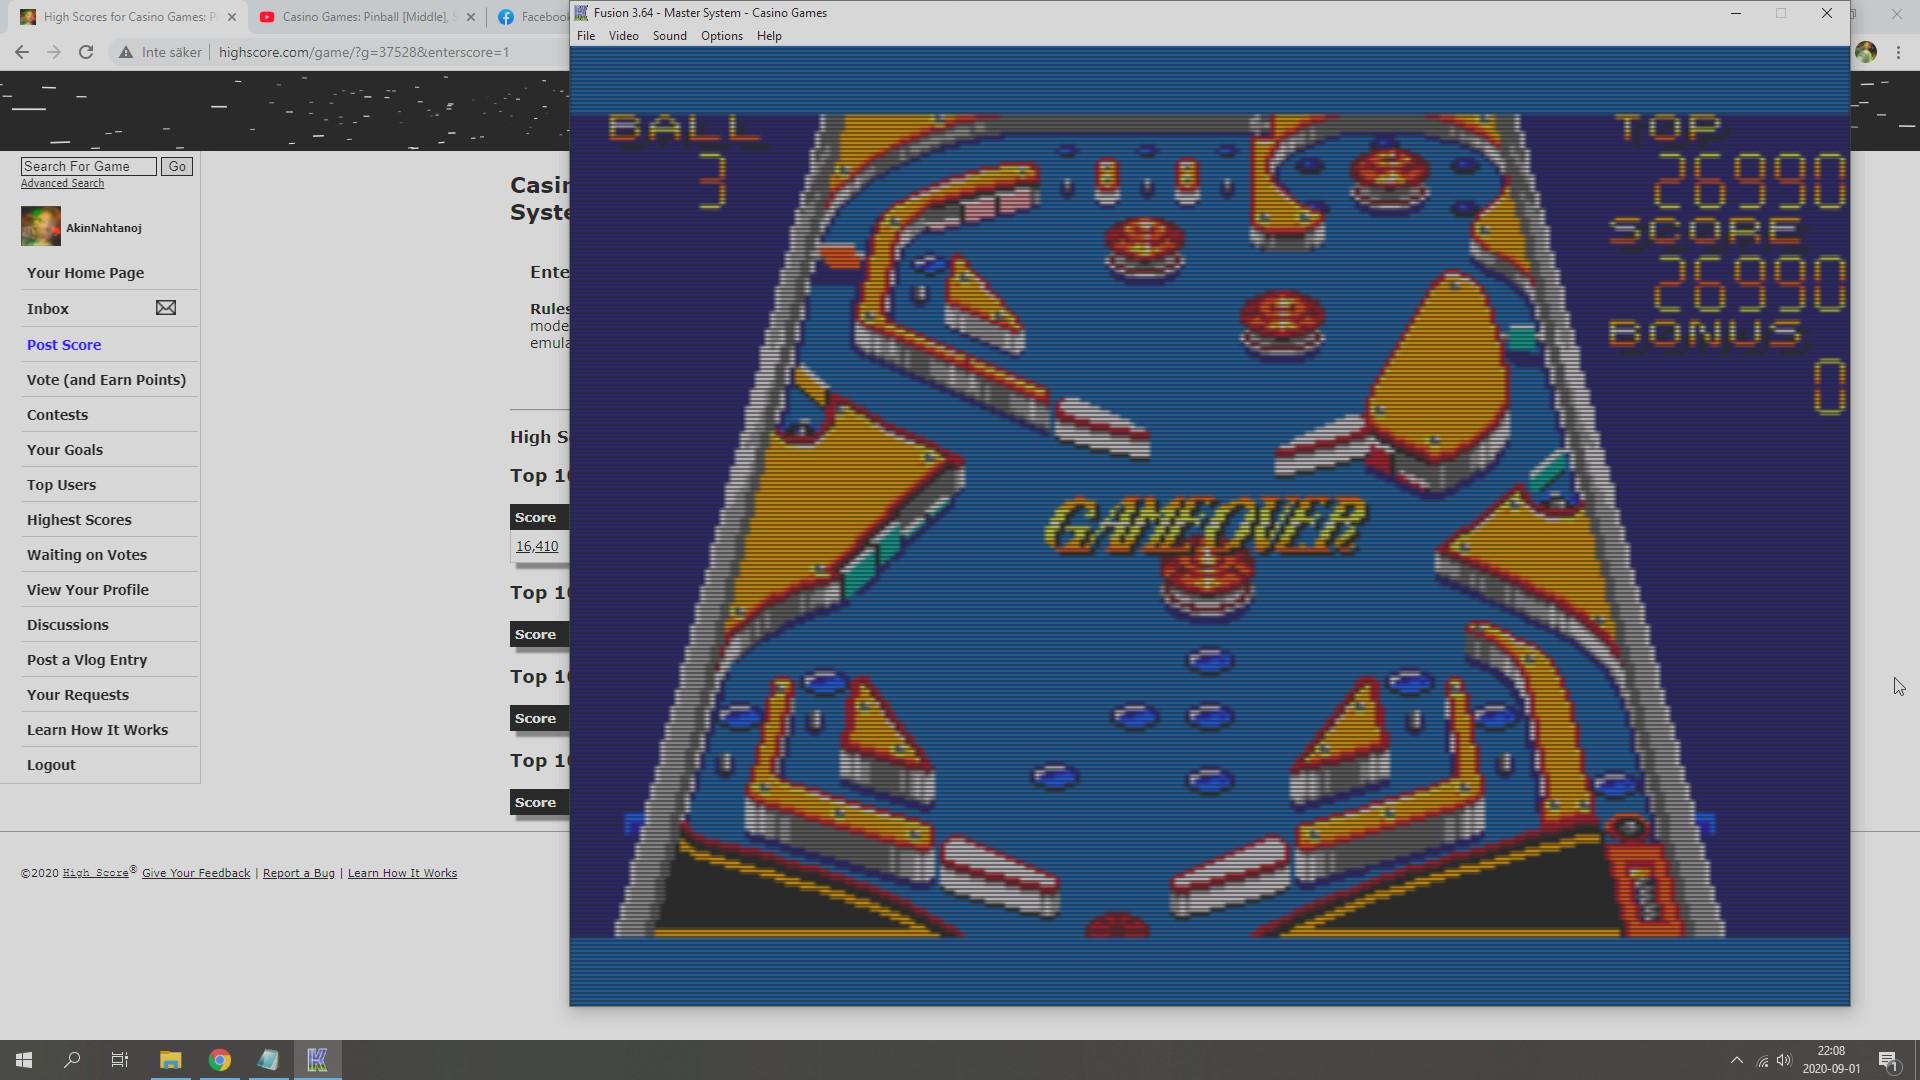 AkinNahtanoj: Casino Games: Pinball [Steep] (Sega Master System Emulated) 26,990 points on 2020-09-01 15:35:01